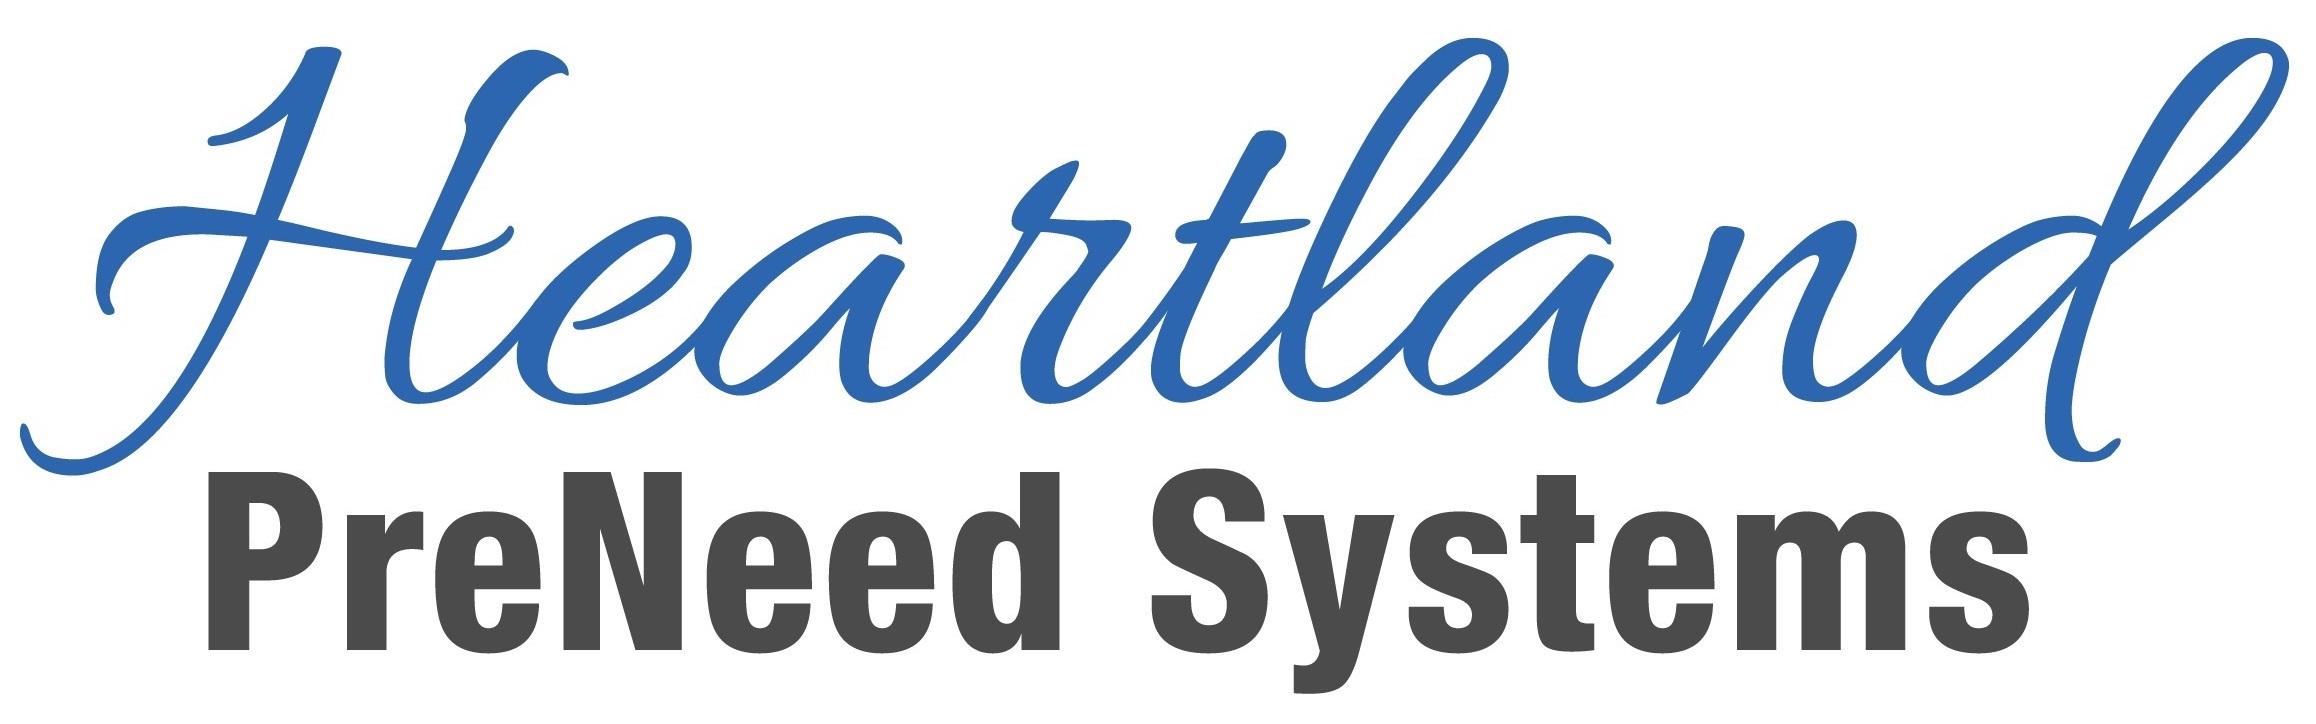 Heartland PreNeed Systems